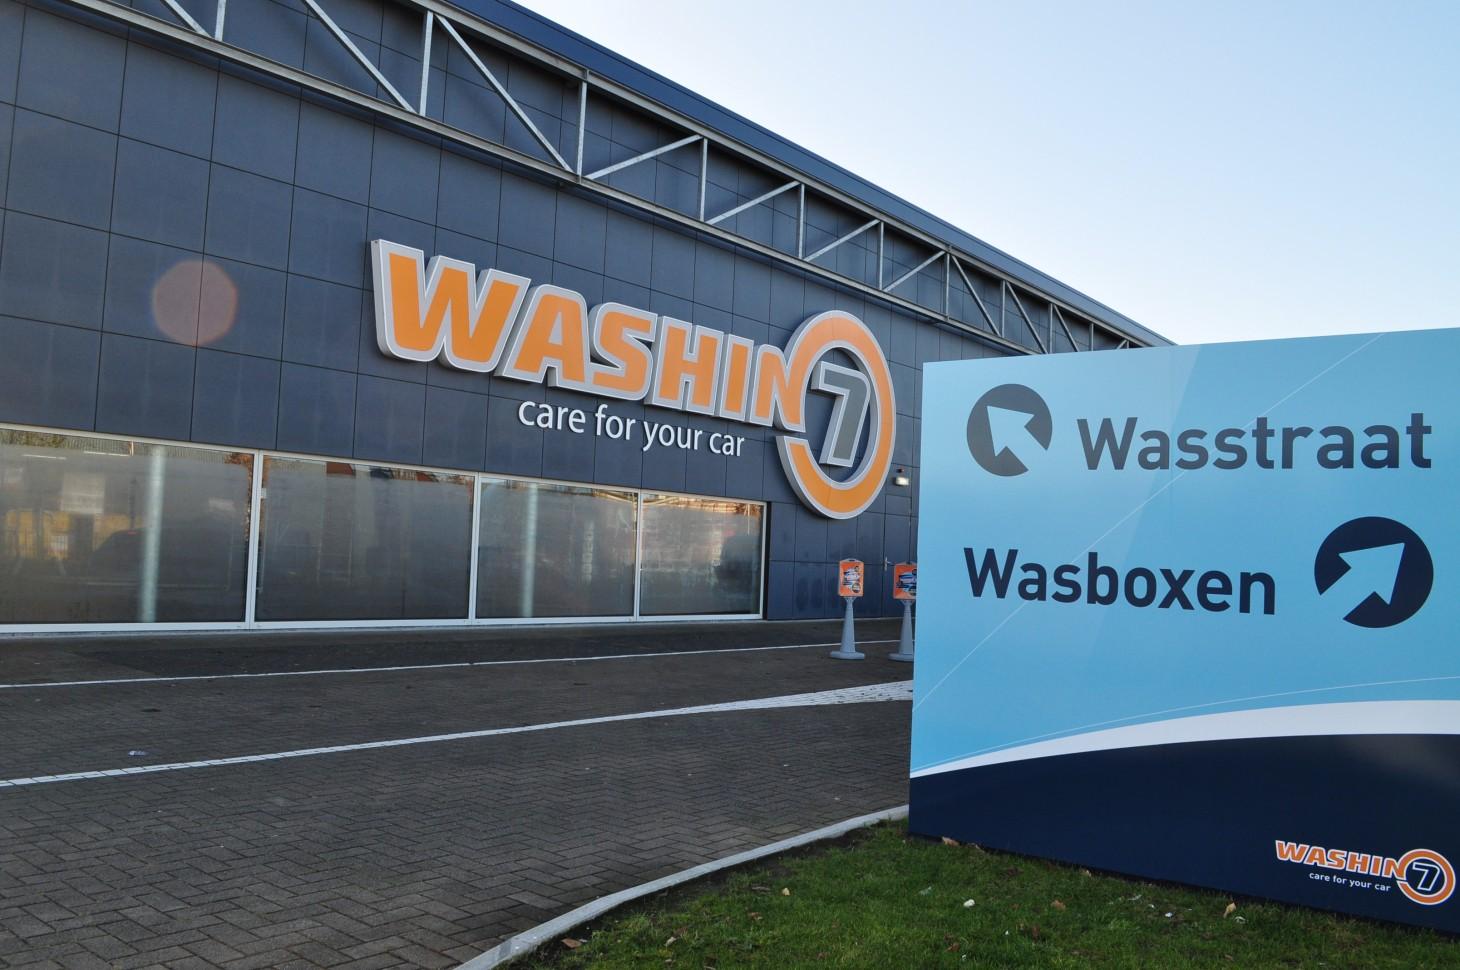 VIZIO Washin7 buitenreclame wandprint signing gevelreclame full color print